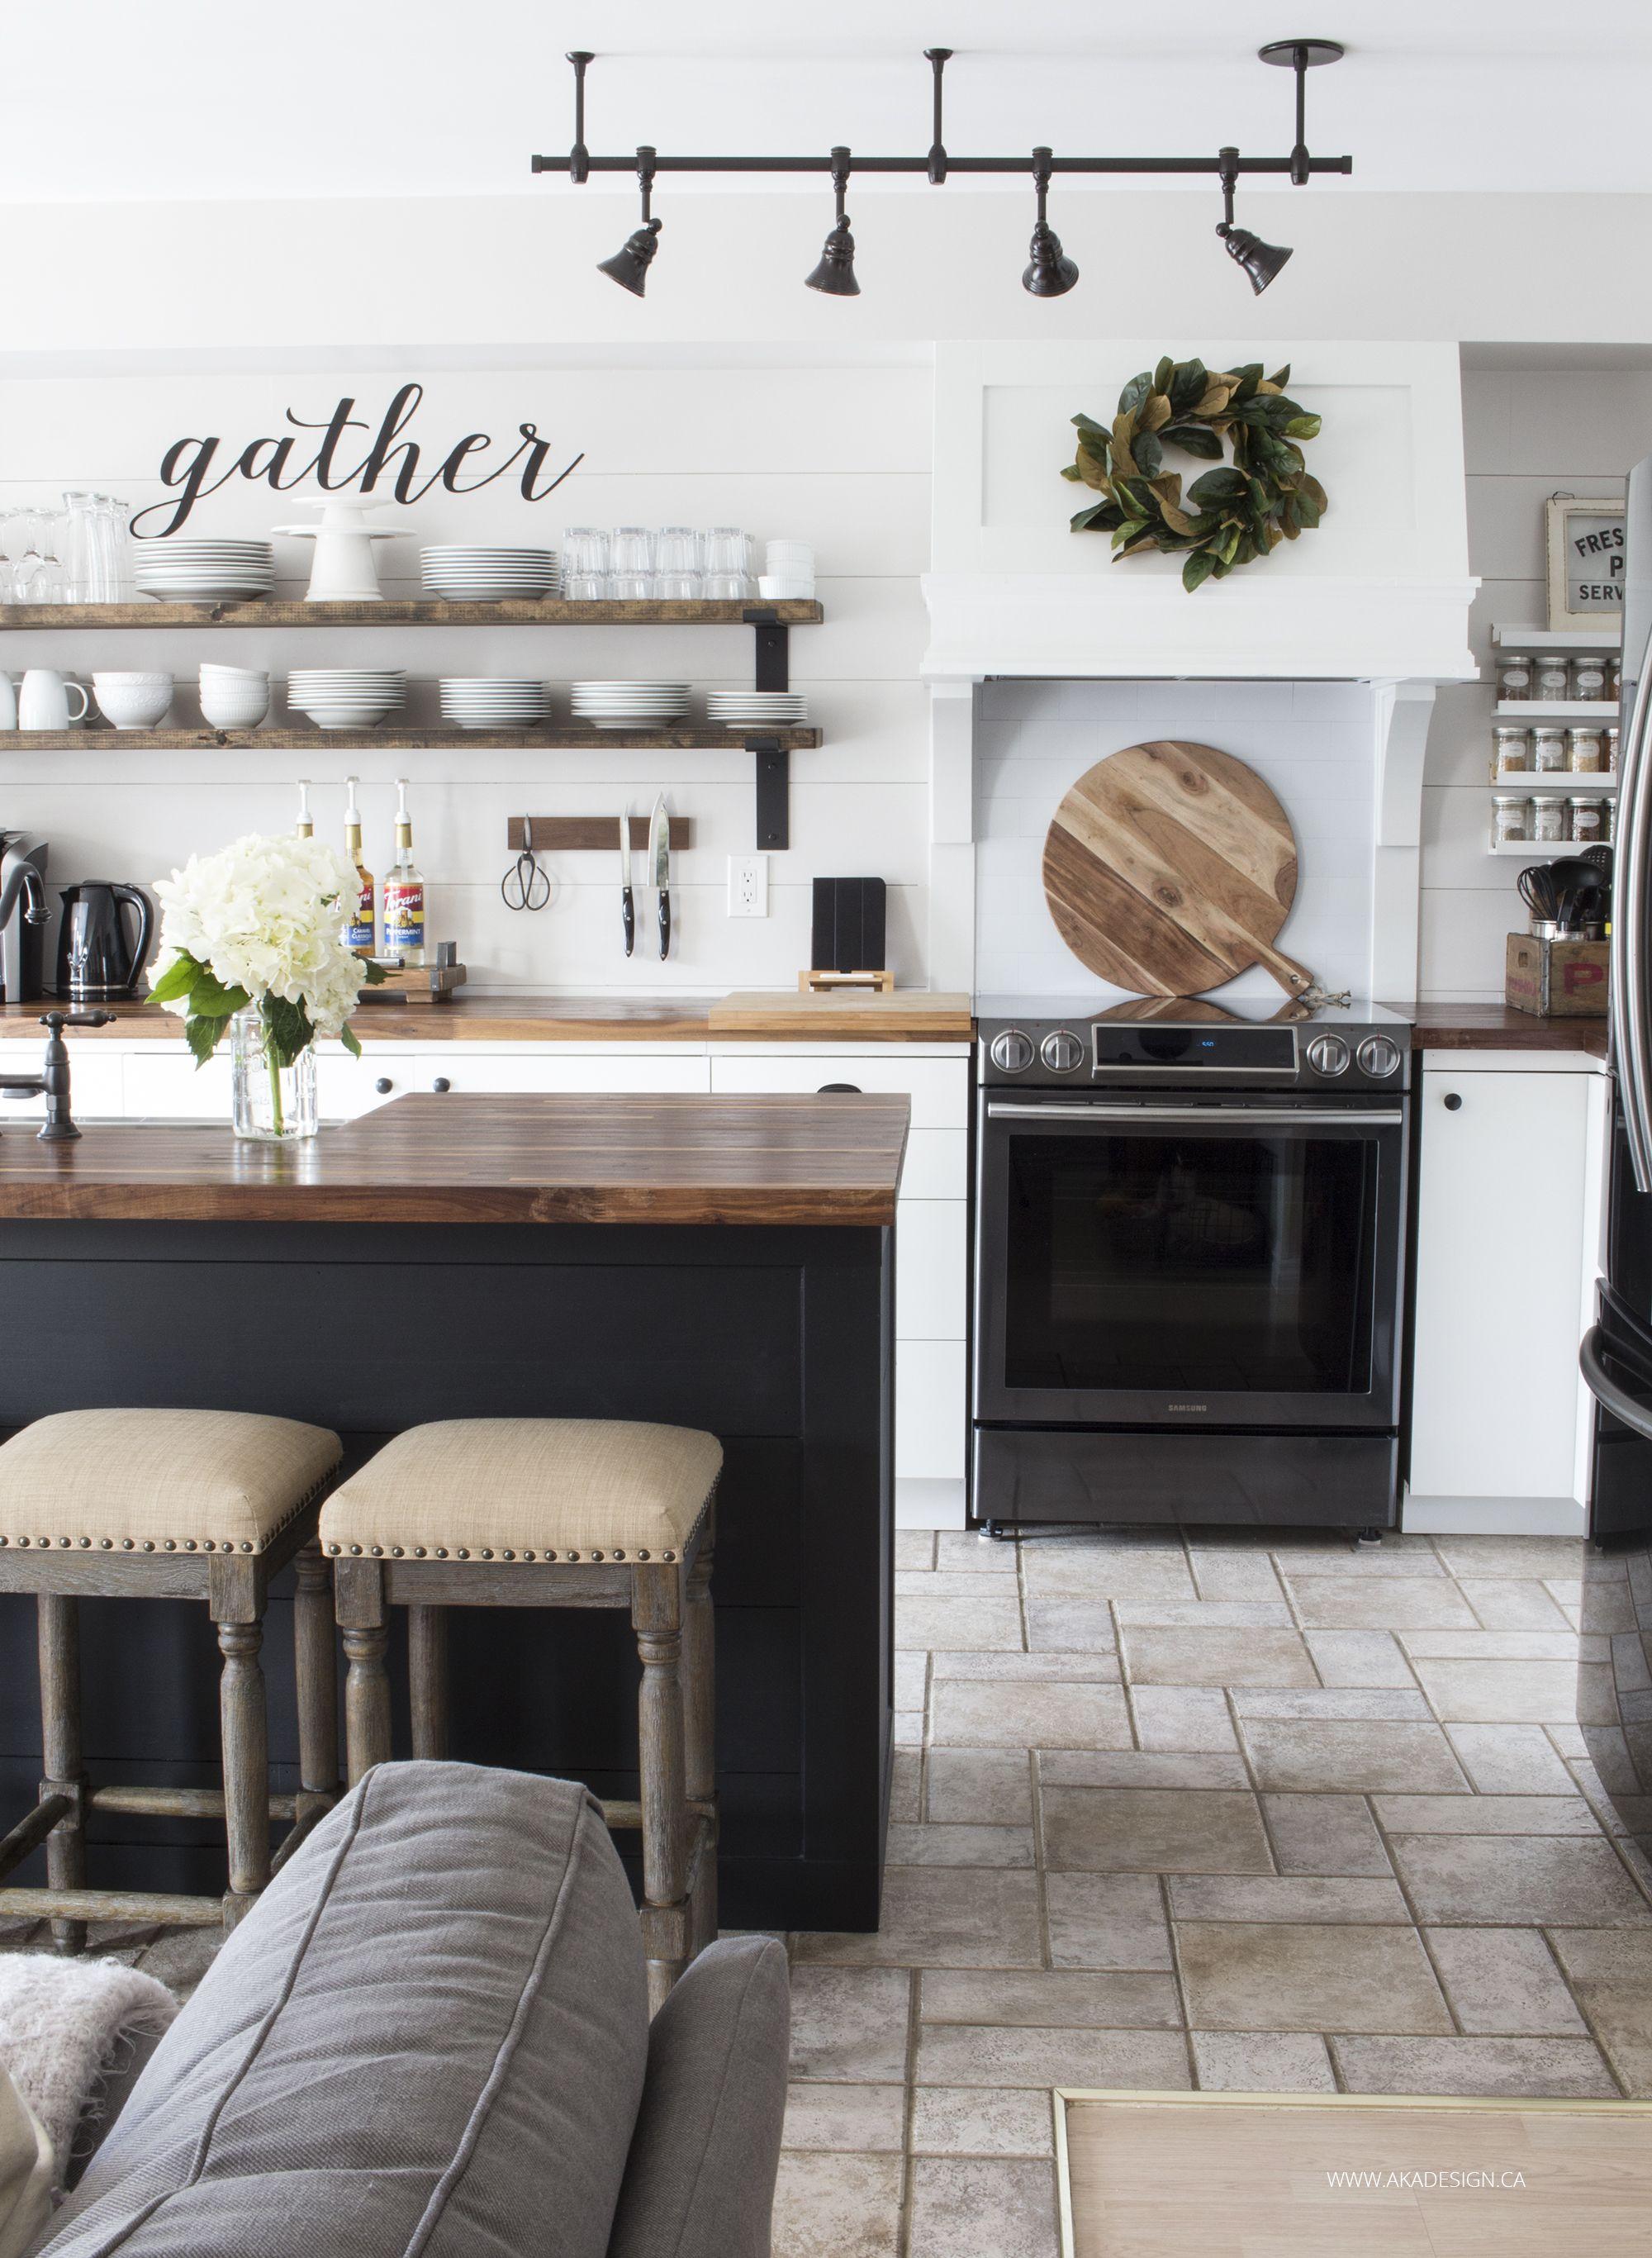 Farmhouse Style Kitchen Islands Flatware Whats New In Fixer Upper Home Decor Volume 20